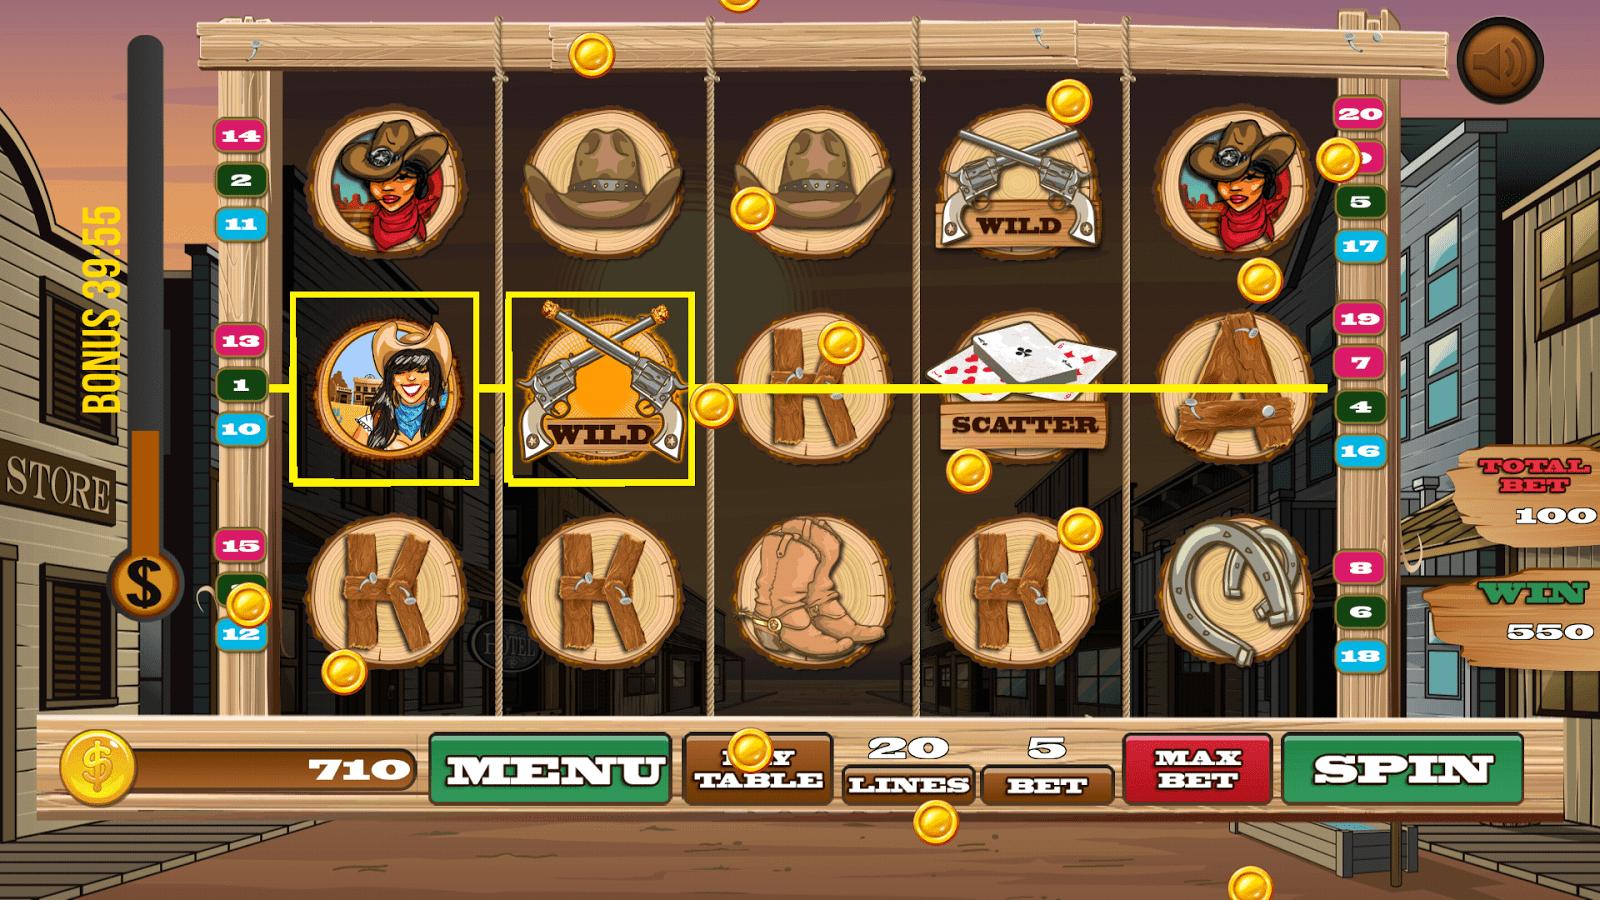 Wild Wild West Slot Machine - How to Play